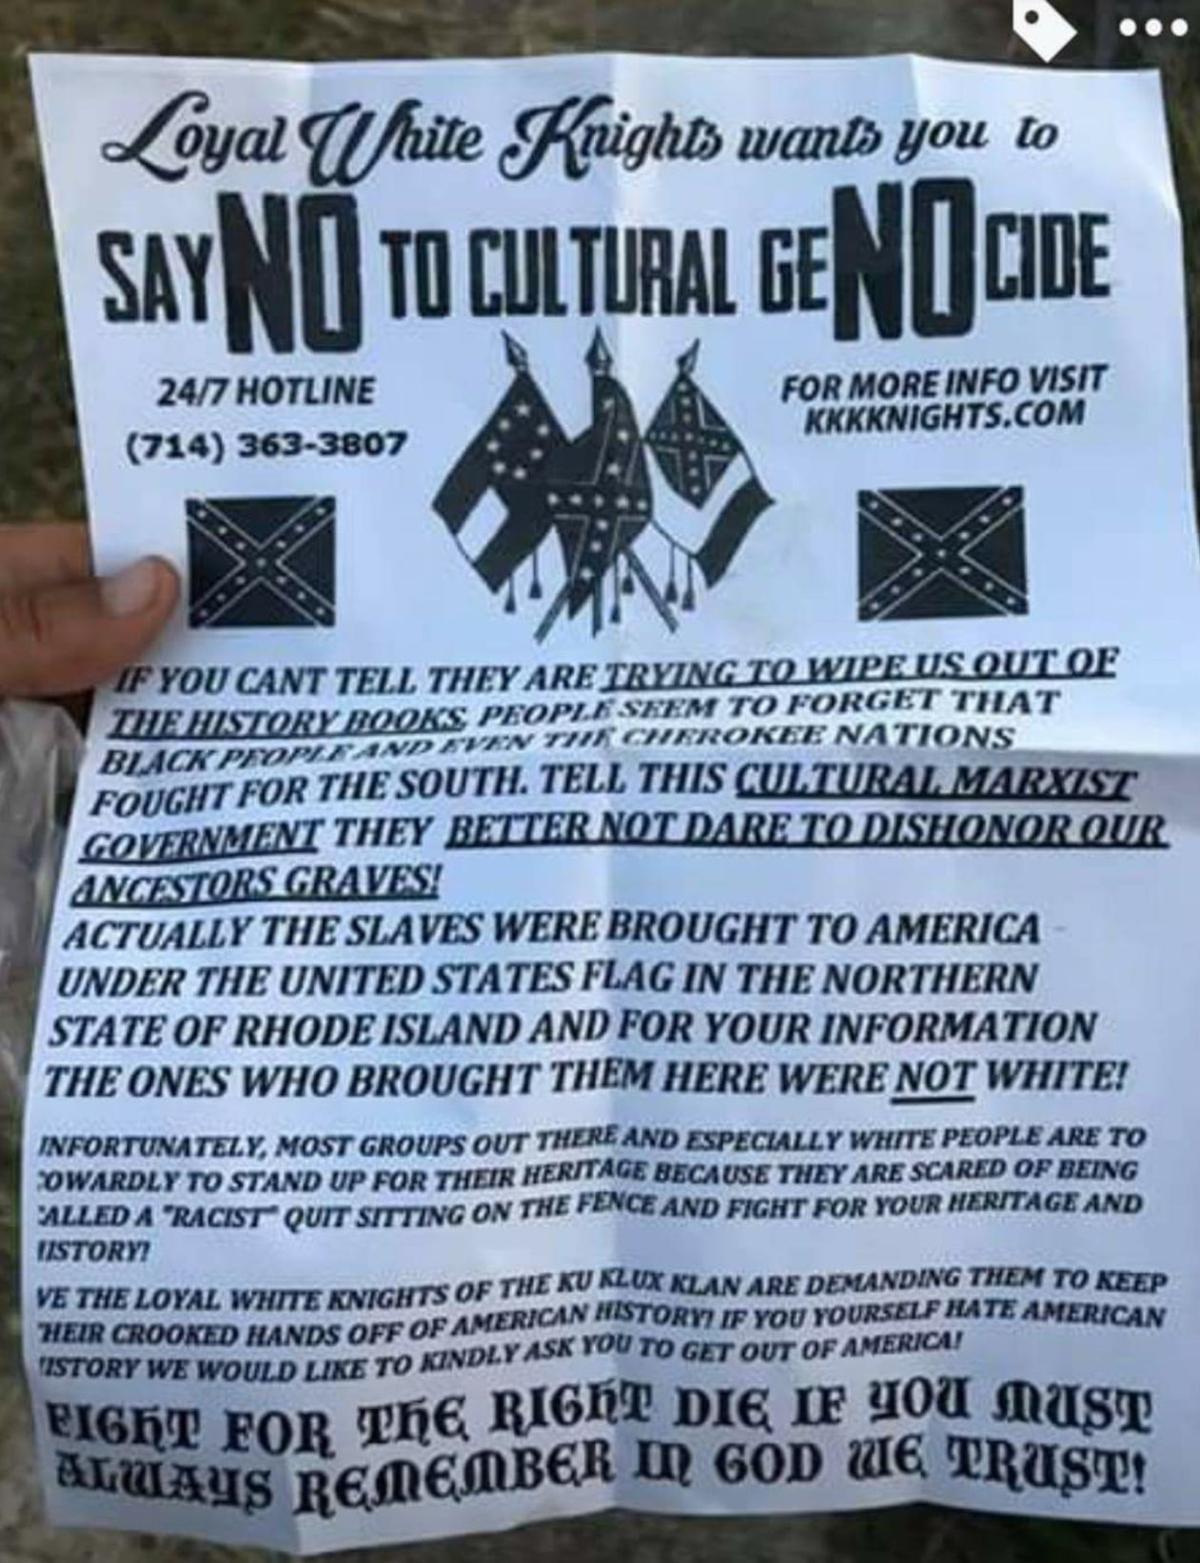 KKK flier